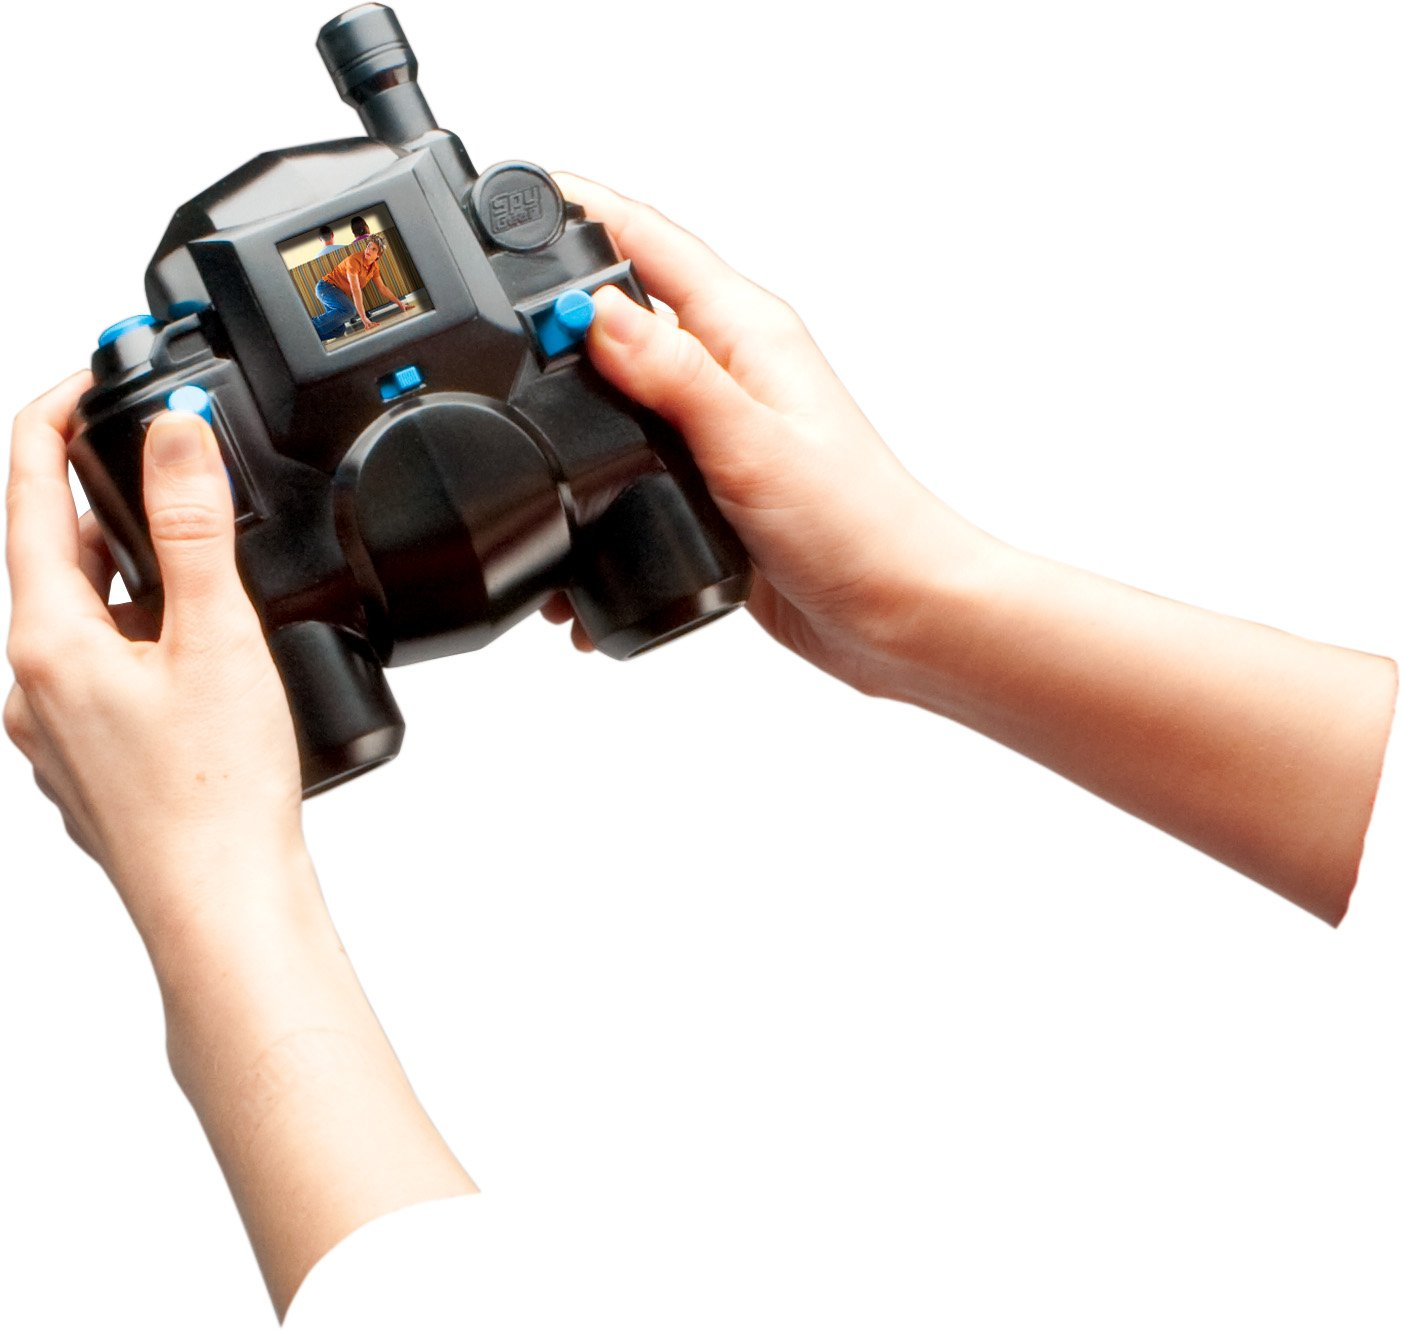 Spy Gear Spy Video Car VX-6 by Spy Gear (Image #2)